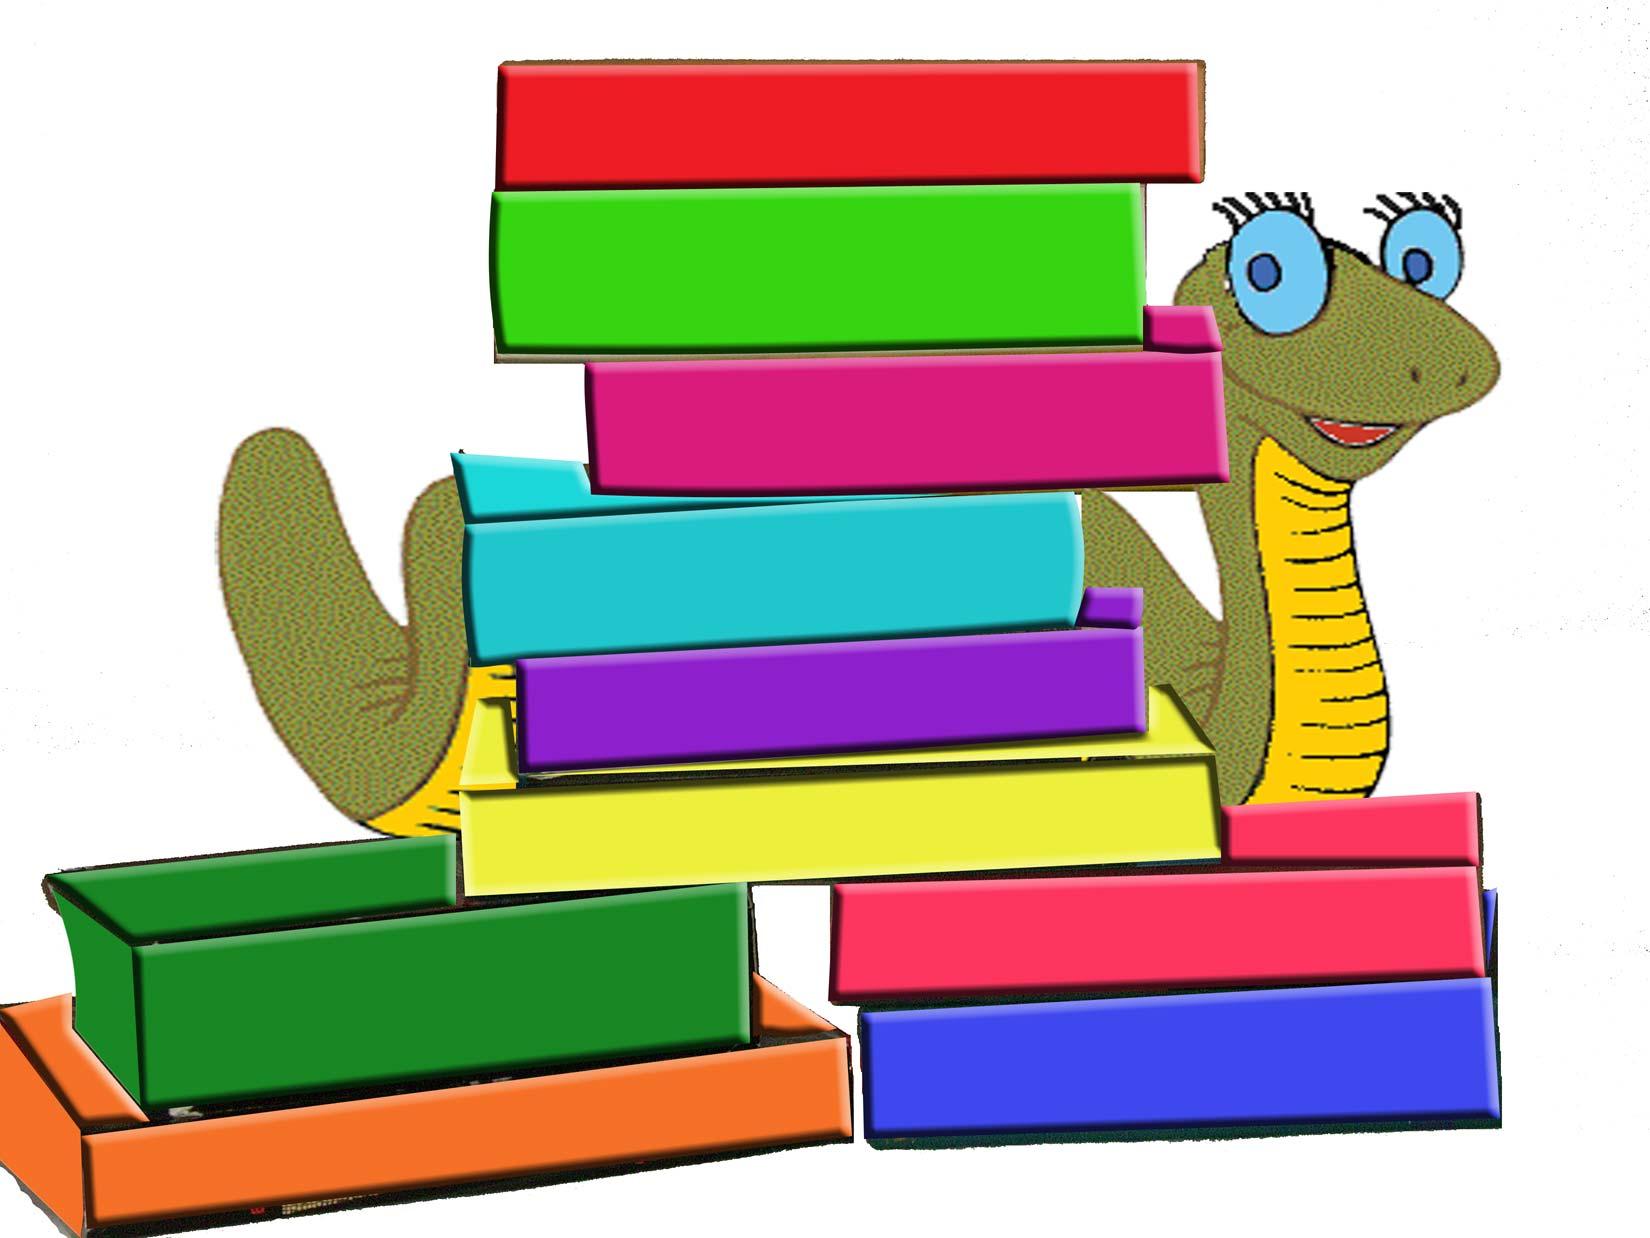 children-s-book-clip-art-children-s-books-clipart-books-20clip-20art ...